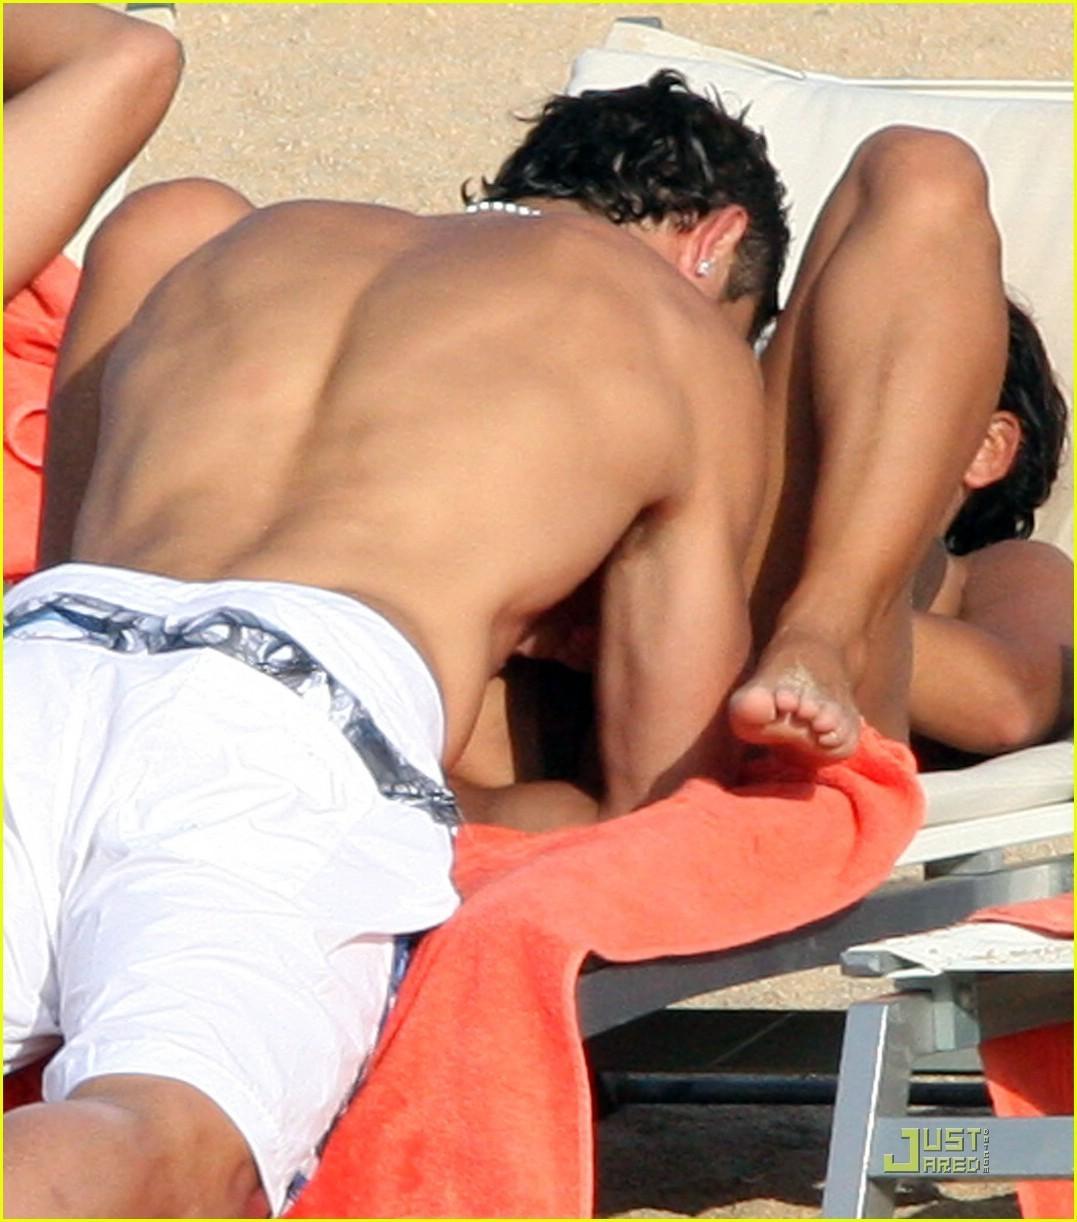 Ronaldo and Nerida on holiday in Italy